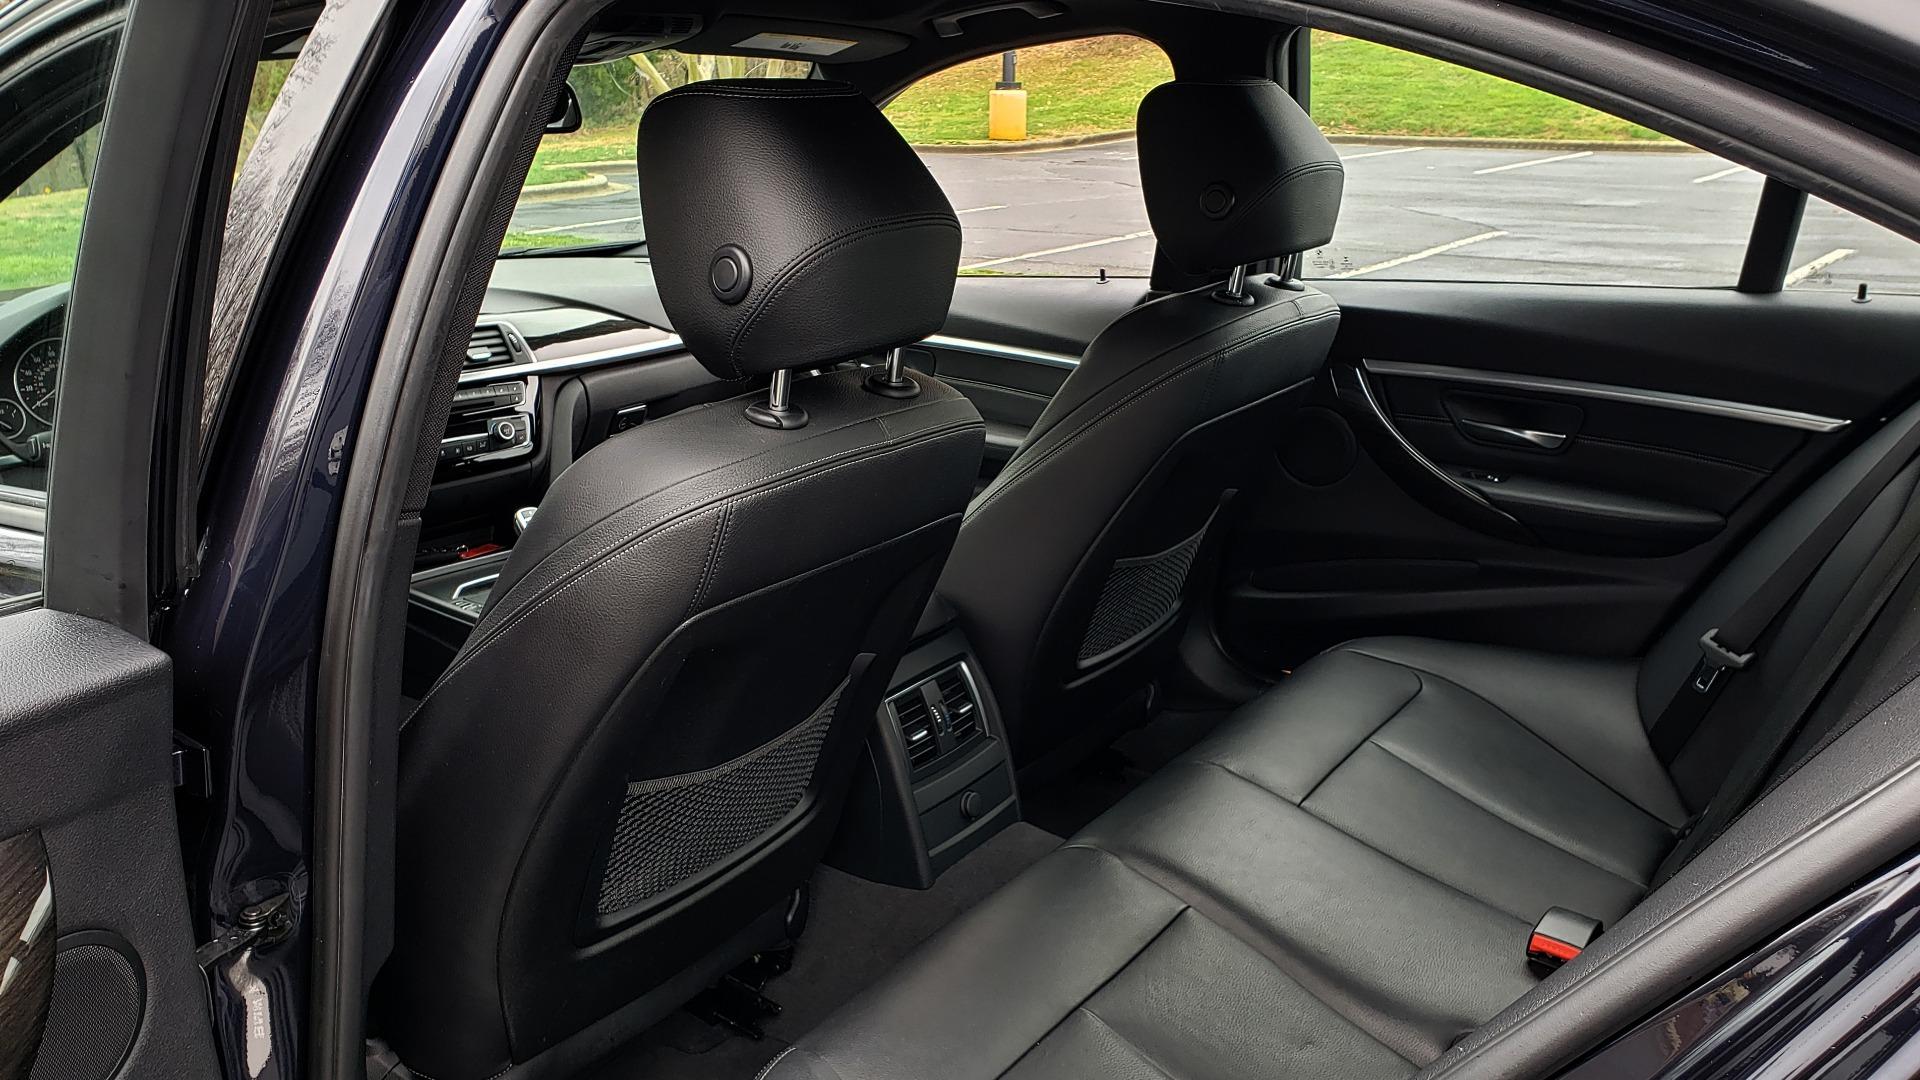 Used 2016 BMW 3 SERIES 328I PREMIUM PKG / DRVR ASST / SUNROOF / PARK ASST for sale Sold at Formula Imports in Charlotte NC 28227 57